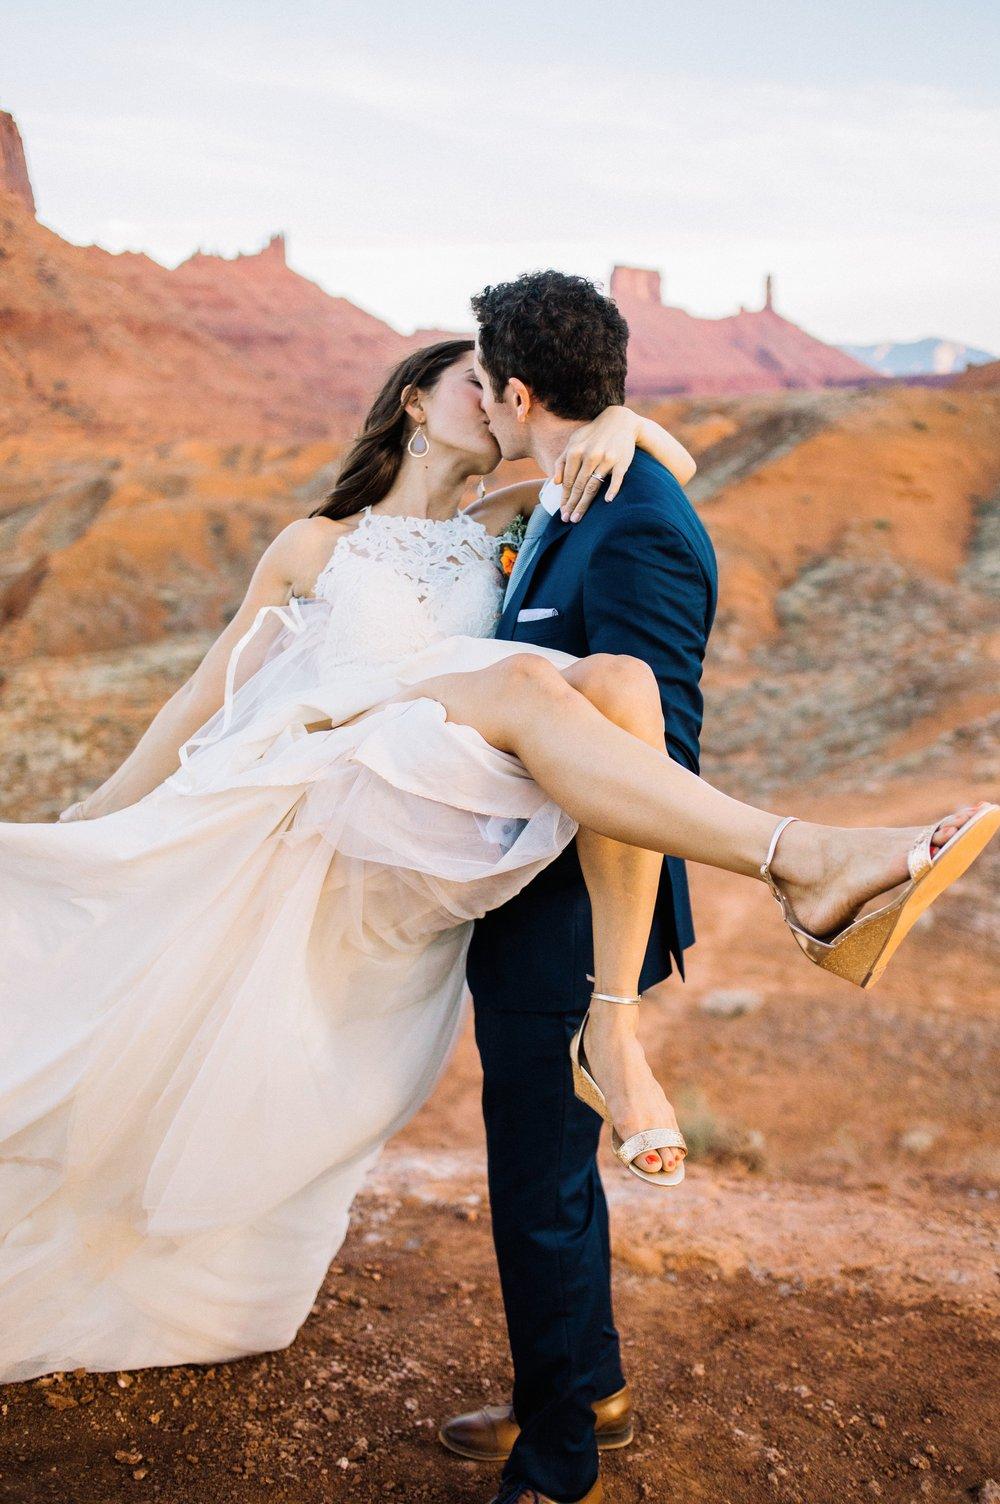 the kiss explosive.jpg